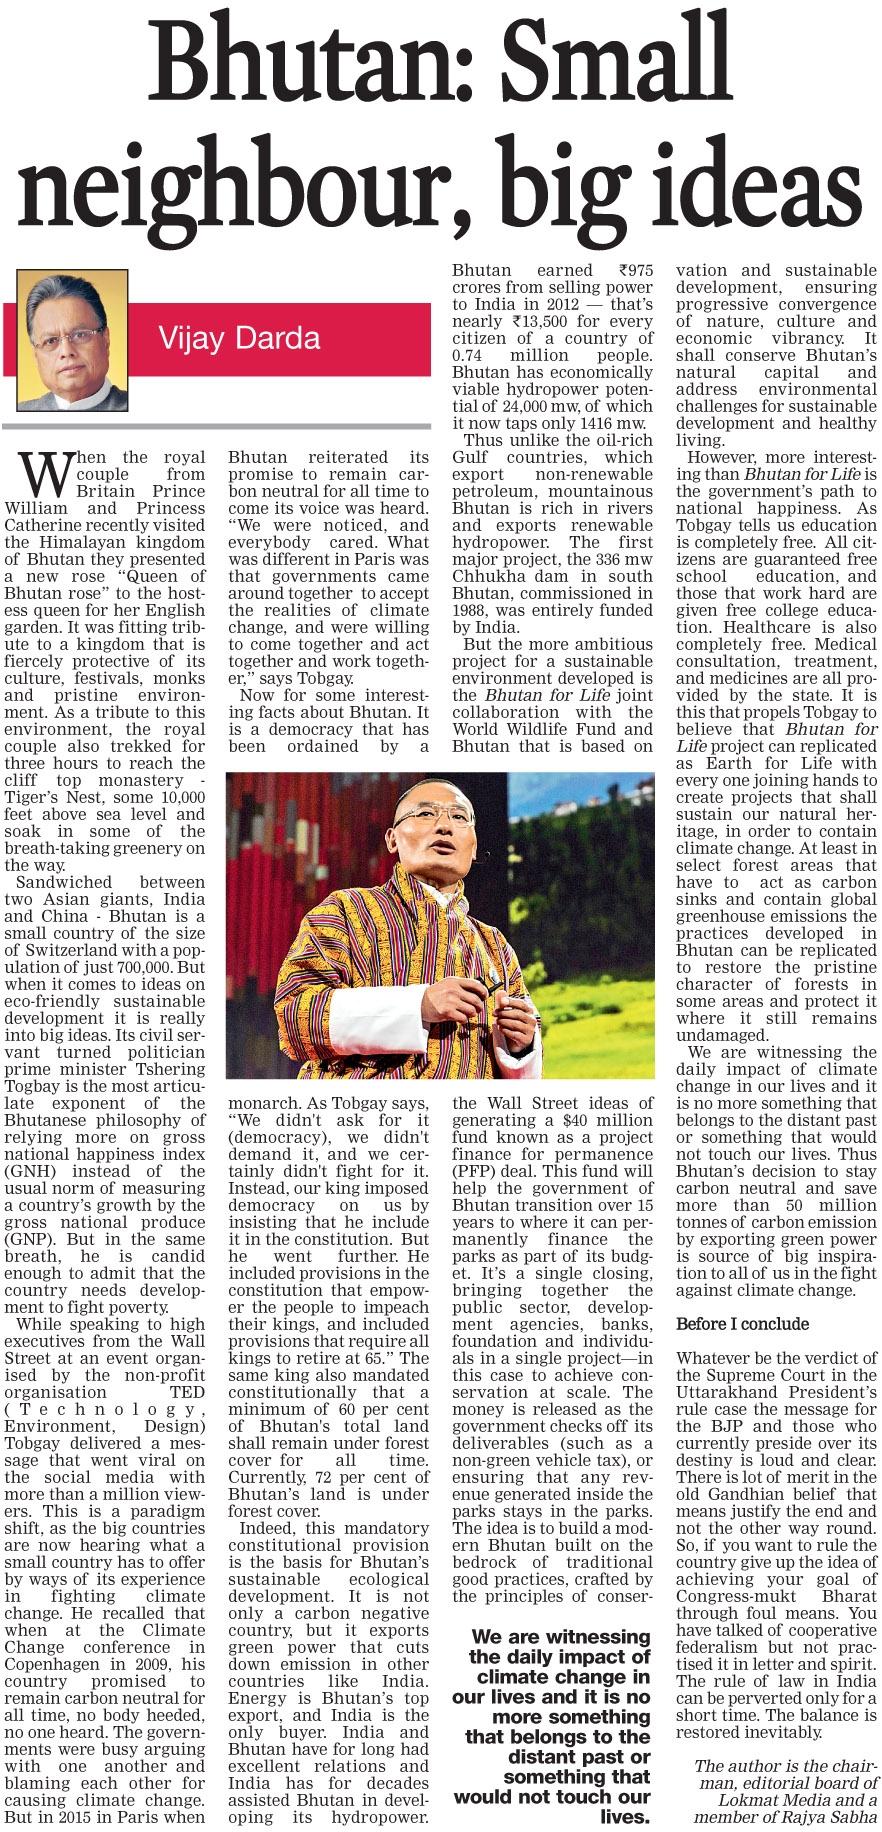 Bhutan: Small neighbour, big ideas